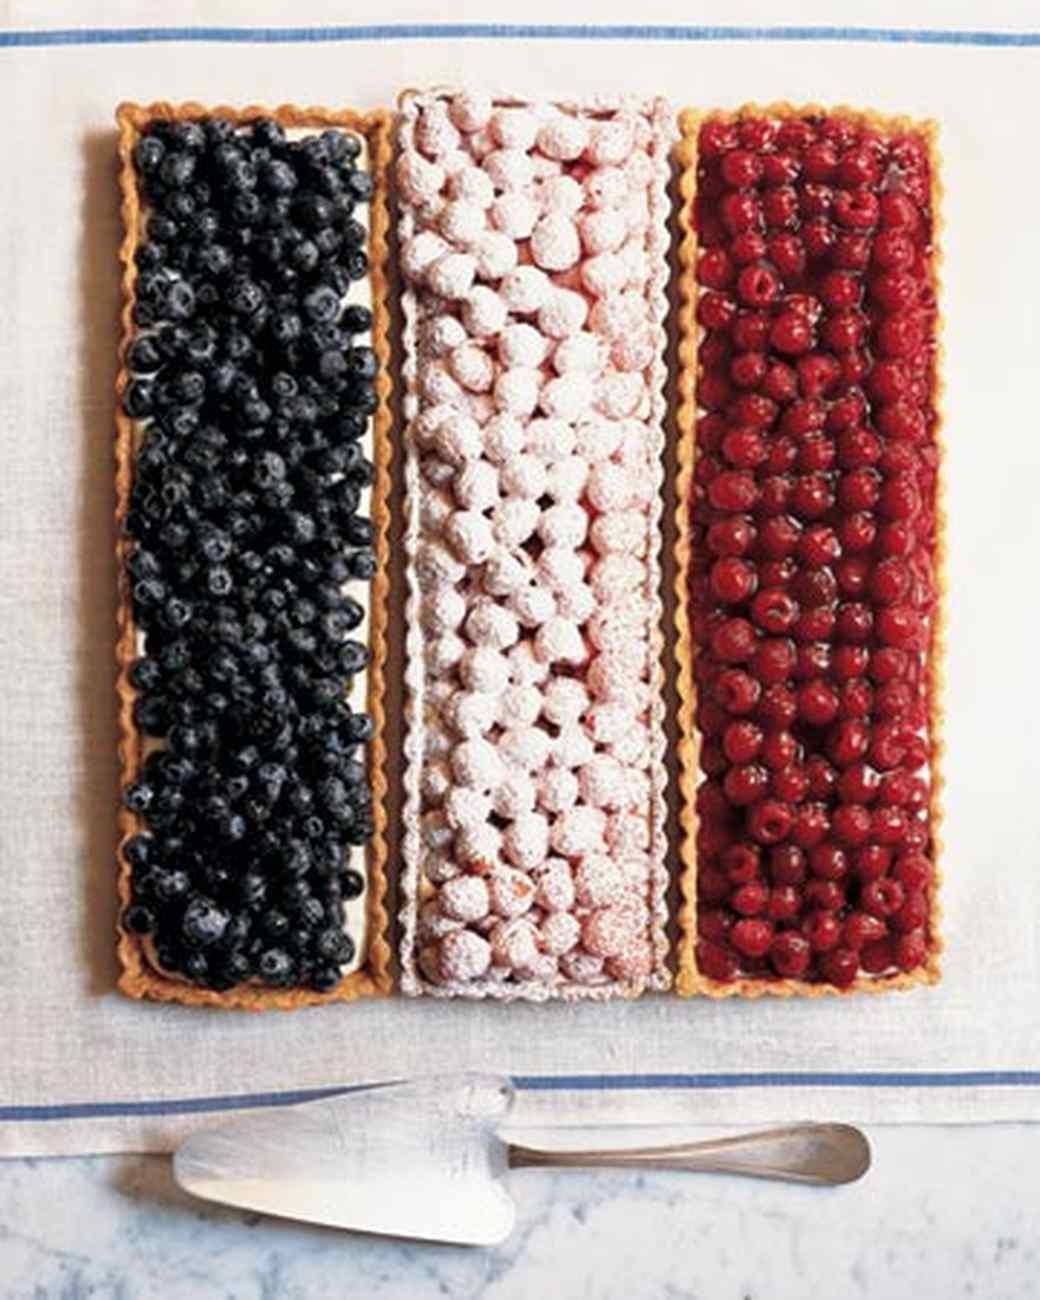 ml207p26_0702_flag_berry_tarts.jpg